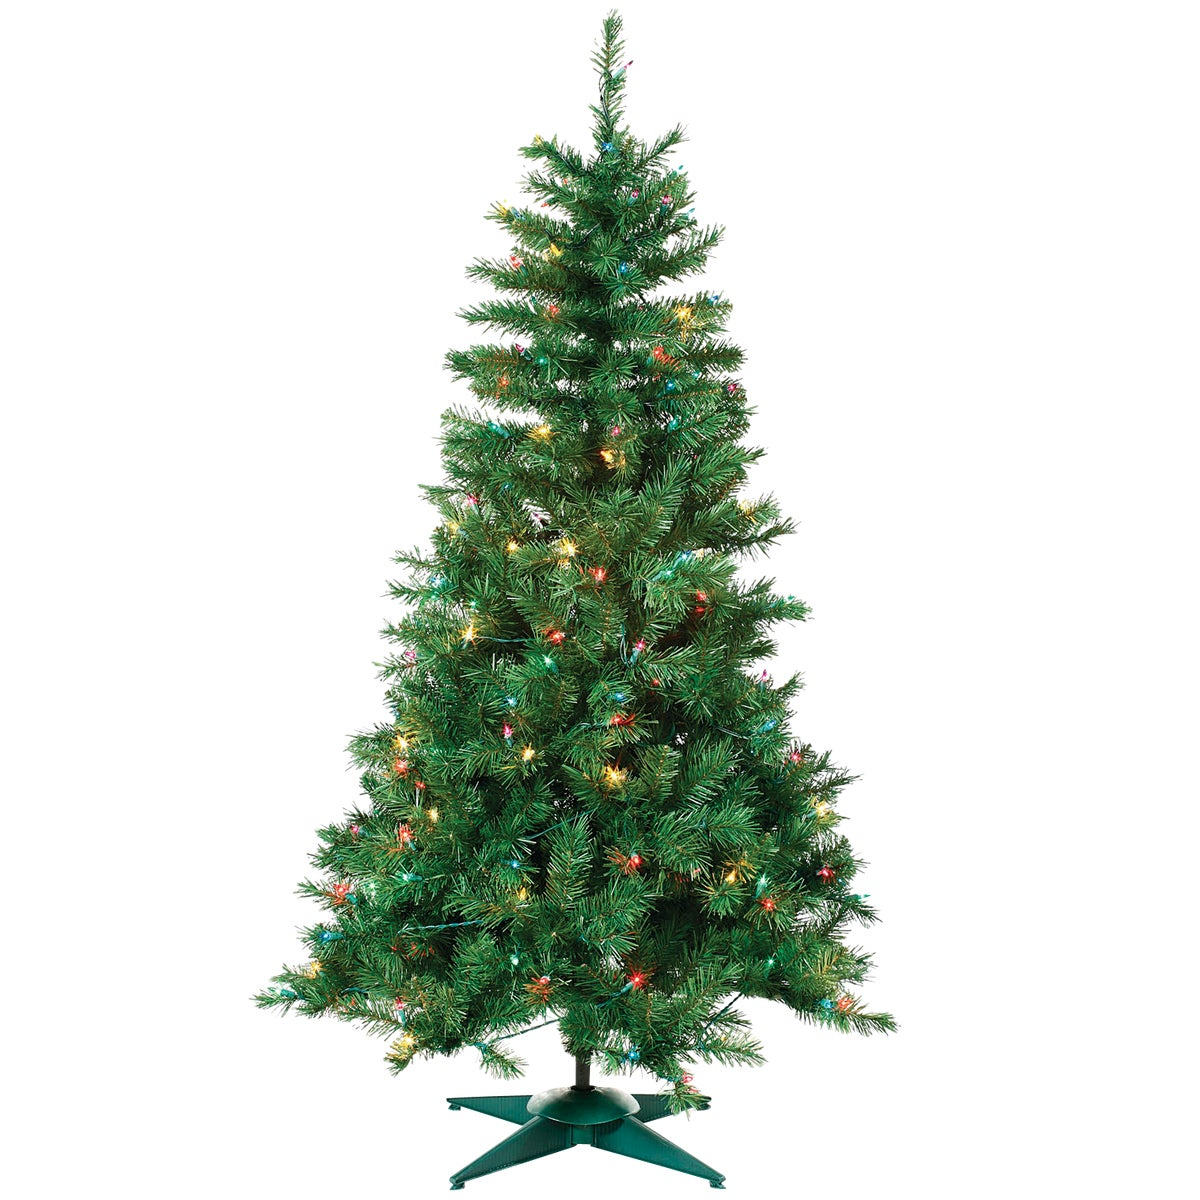 4'P/L COLRAD SPRUCE TREE